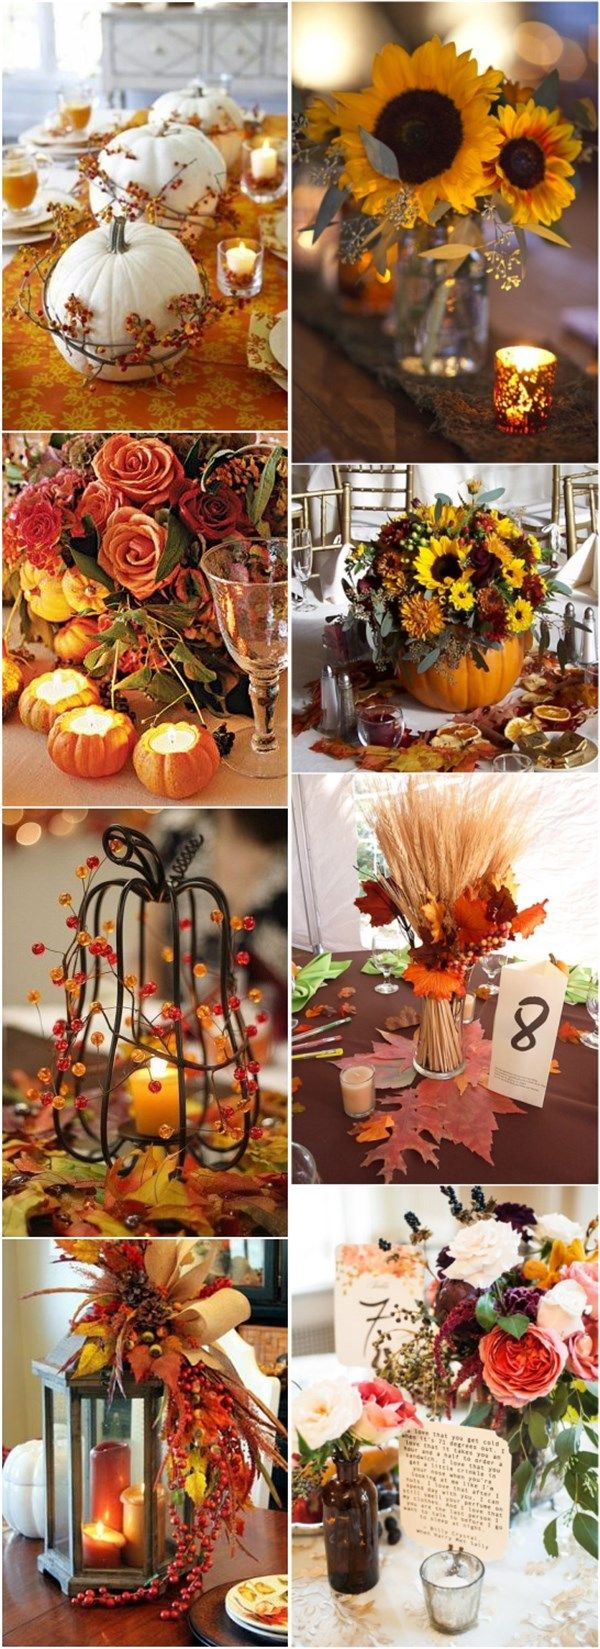 Fall wedding decor ideas autumn fall wedding centerpieces deer fall wedding decor ideas autumn fall wedding centerpieces deer pearl flowers junglespirit Choice Image